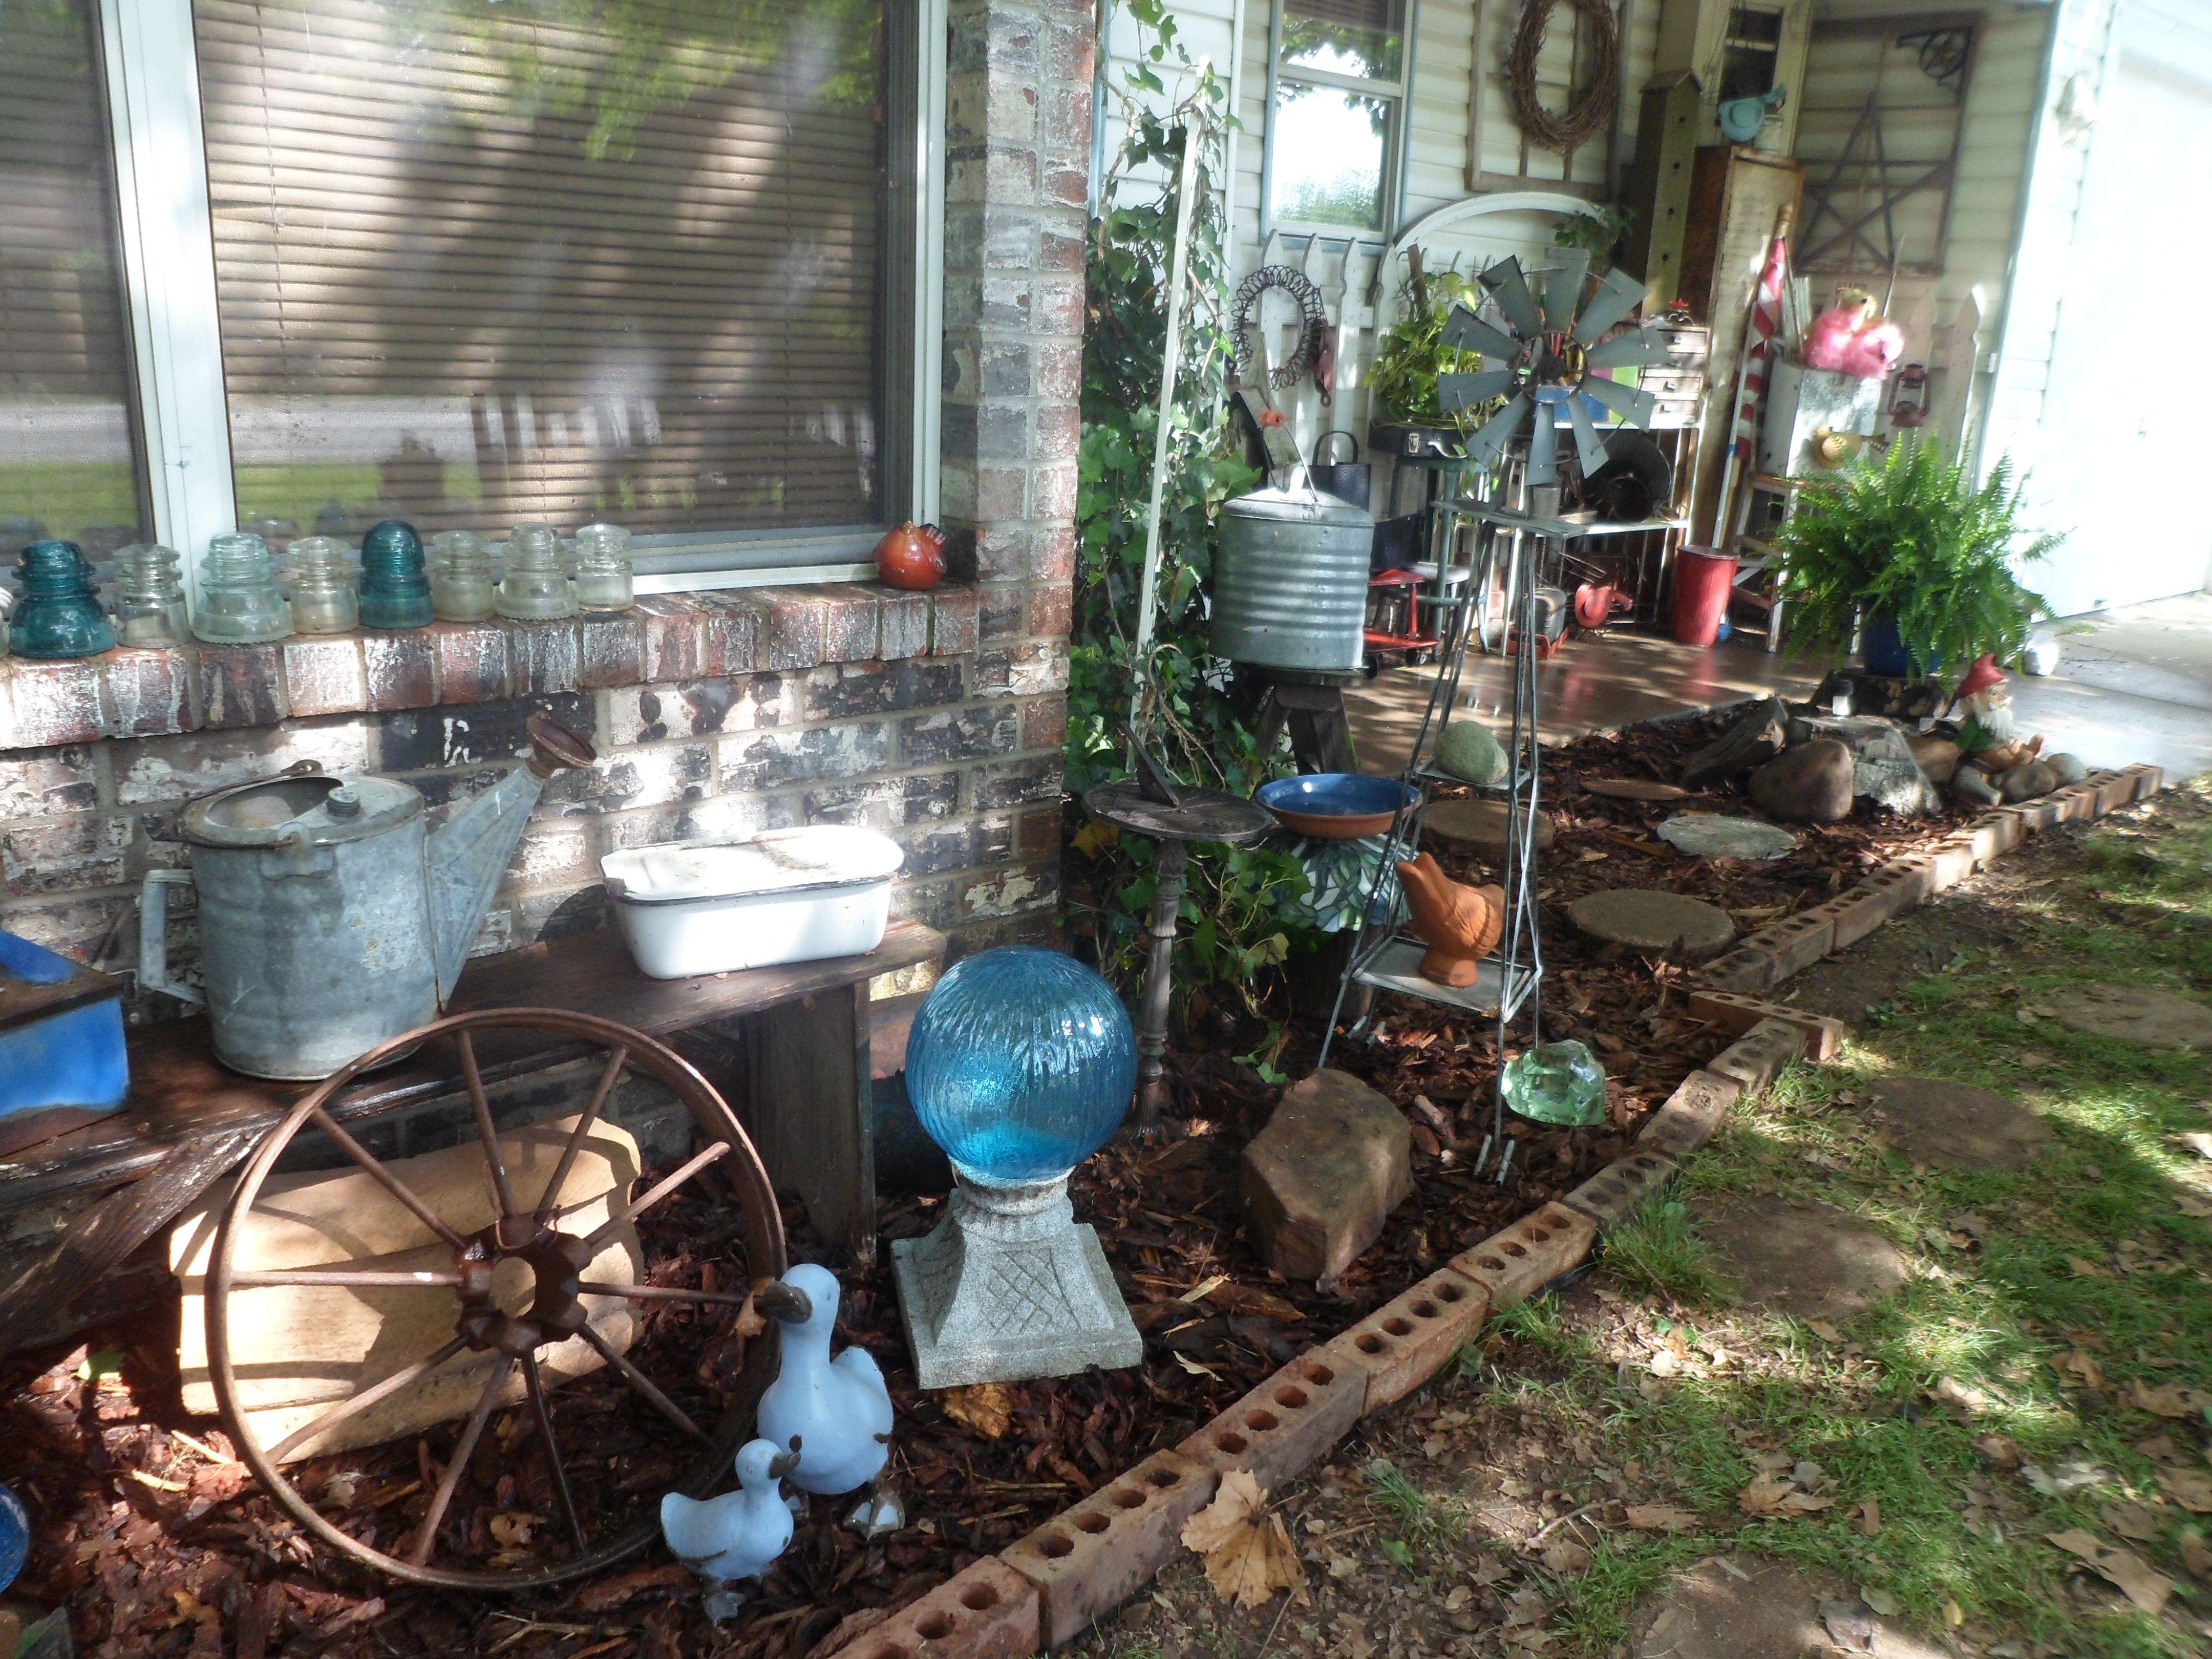 Garden And Yard Junk.